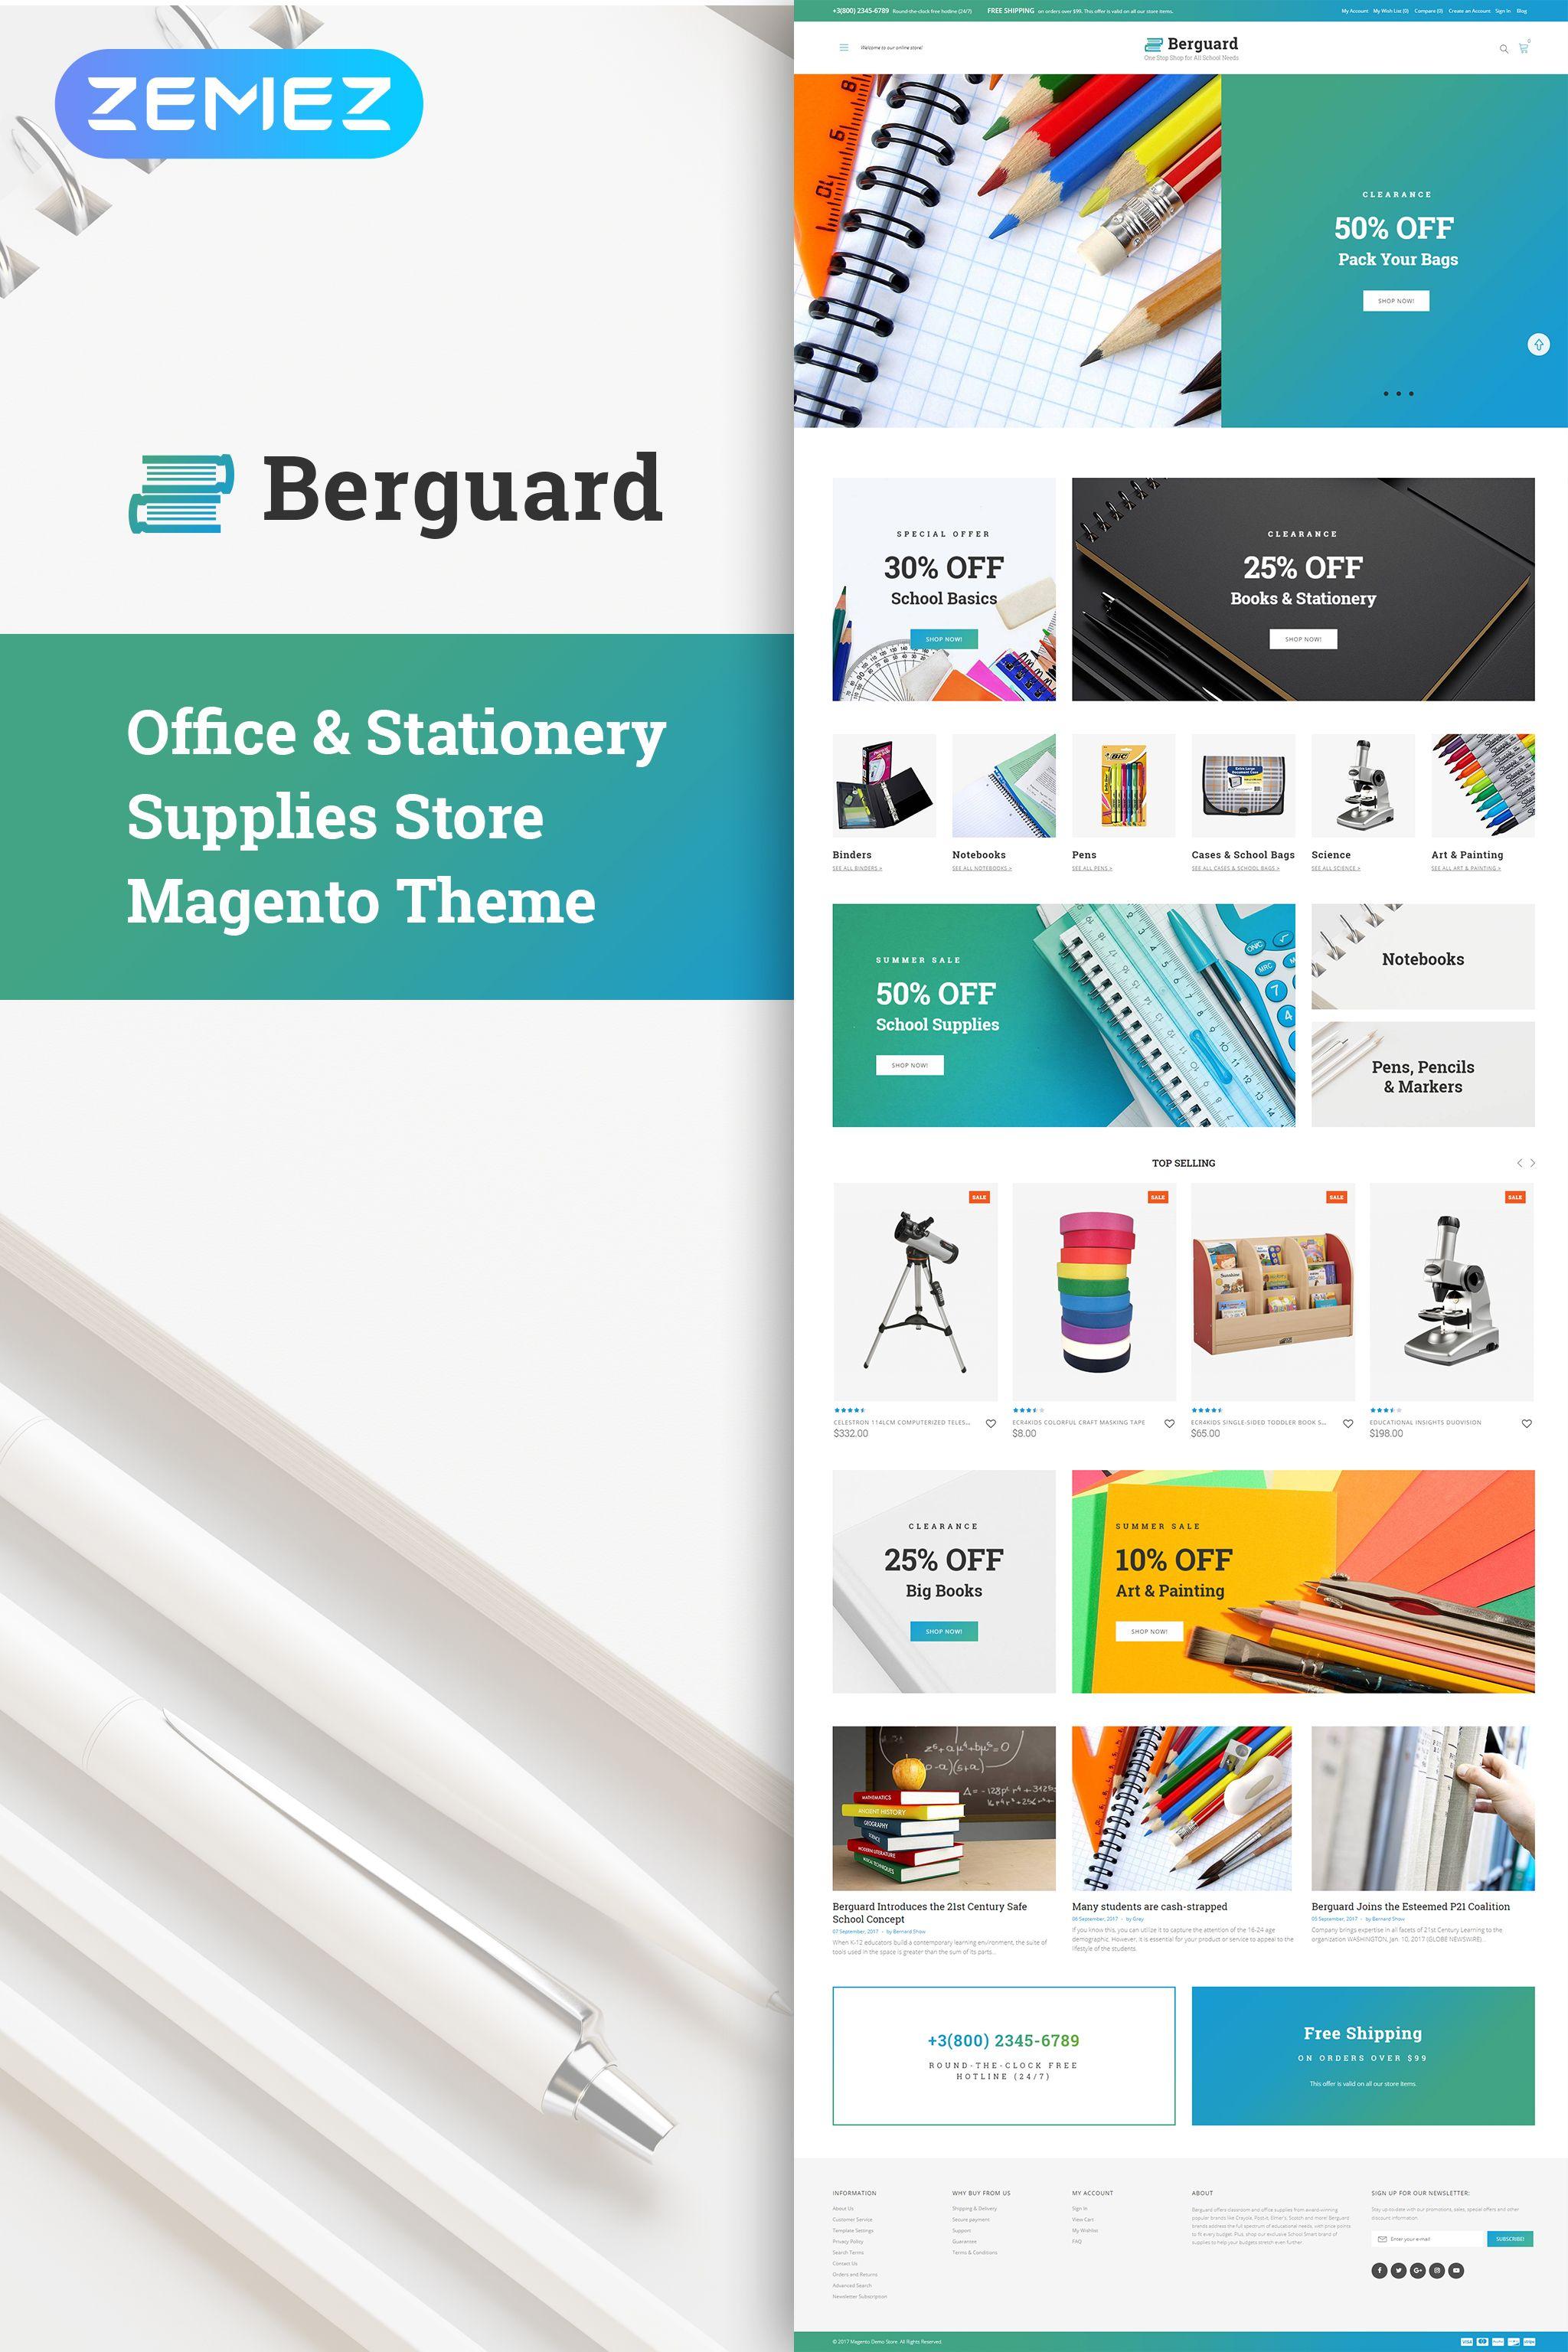 Berguard Office Magento Themes Book Stationery Portfolio Website Template